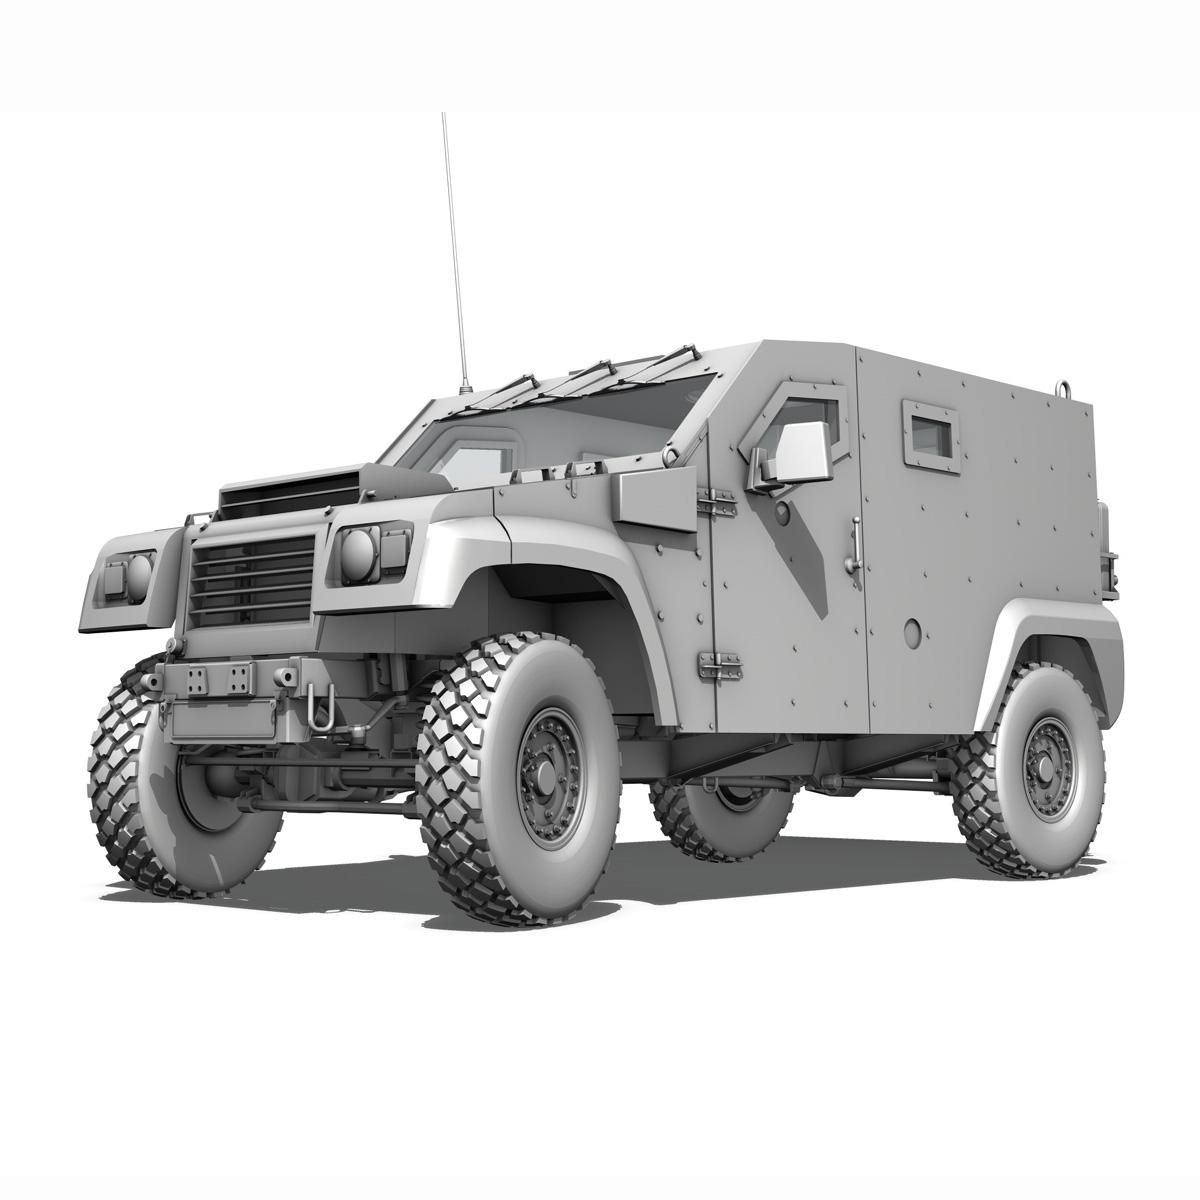 auverland panhard pvp petit vehicule protege 3d model flatpyramid. Black Bedroom Furniture Sets. Home Design Ideas